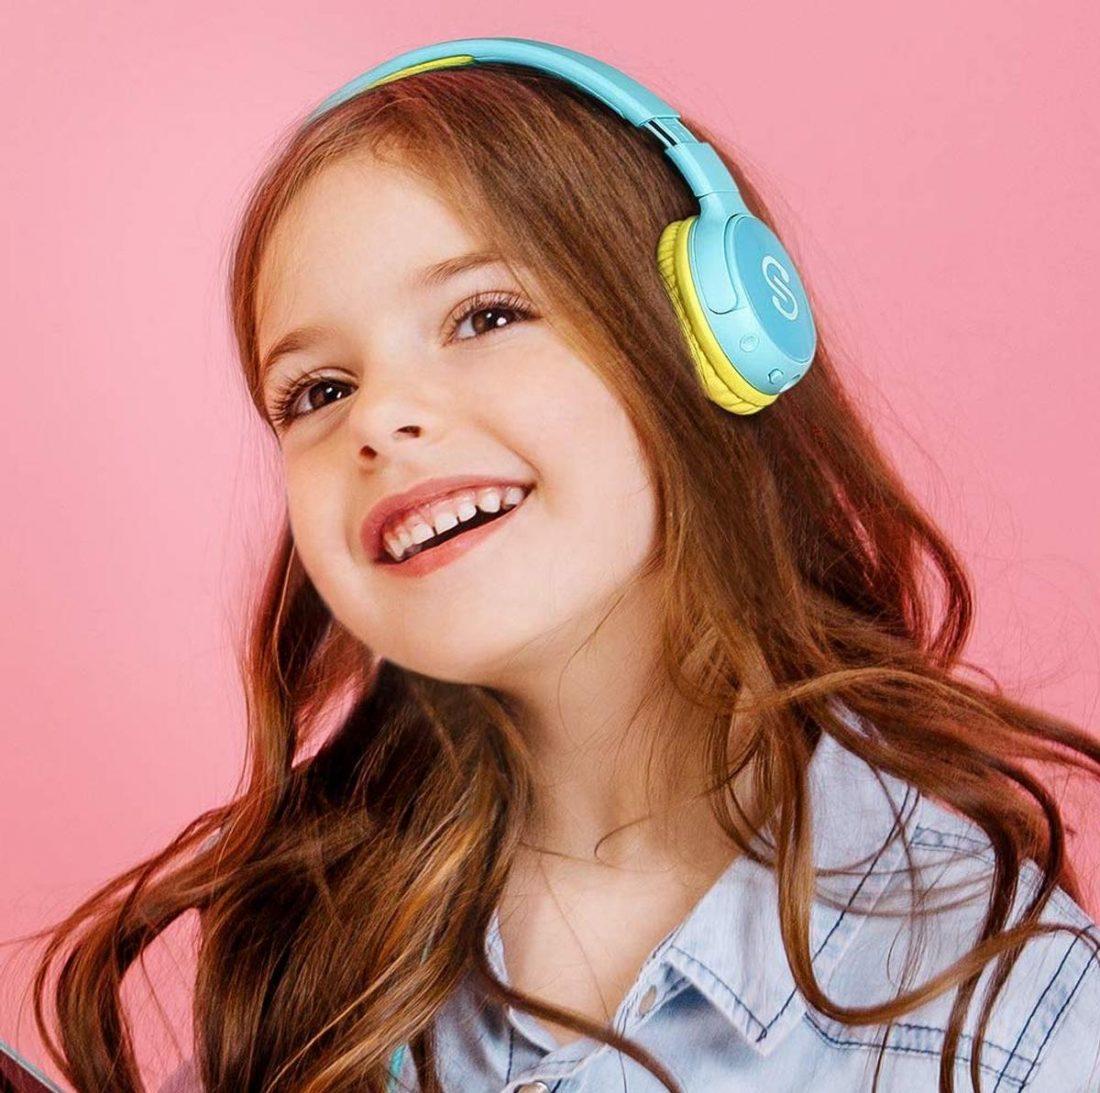 Kid wearing SoundPEATS headphones